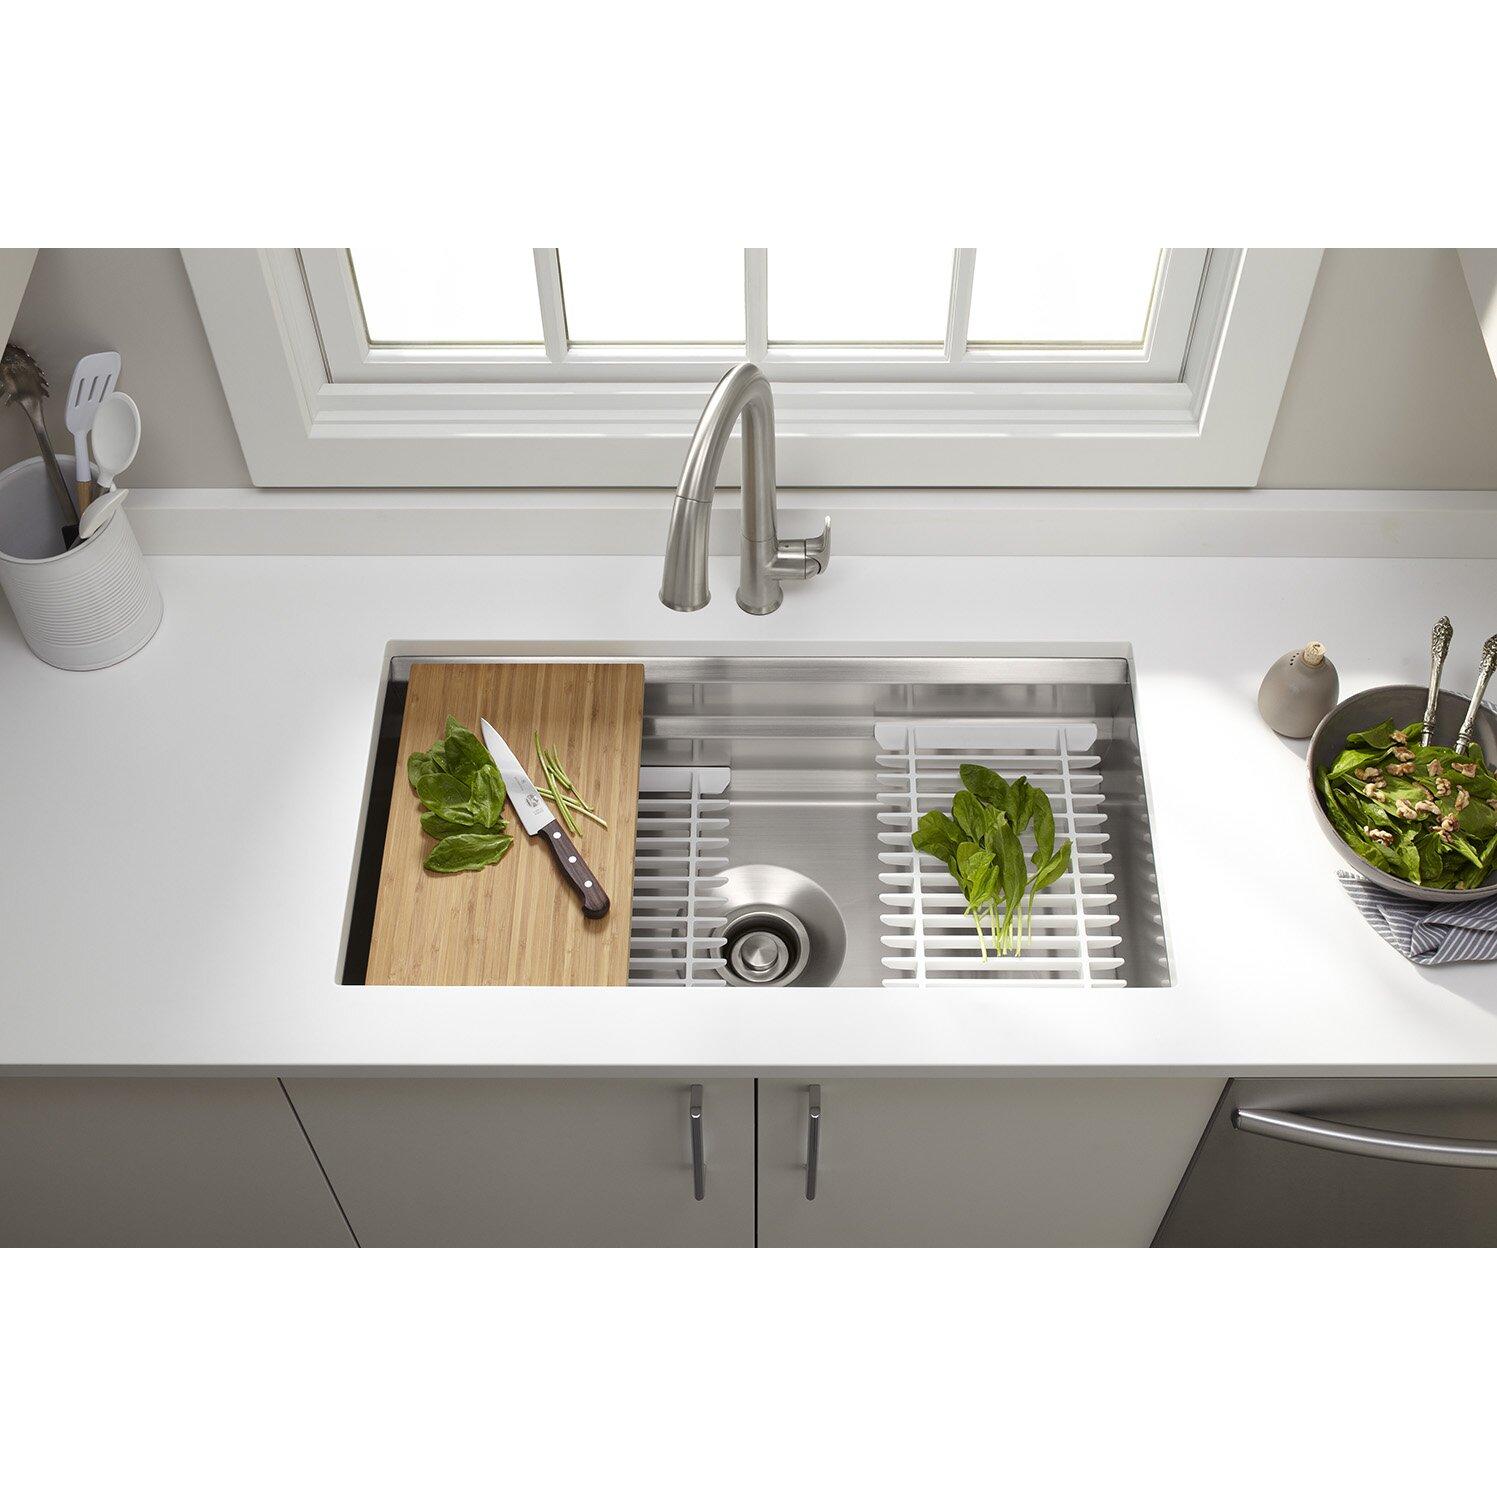 Prolific 33 x 17 3 4 x 11 undermount single bowl for Kitchen set 4 x 3